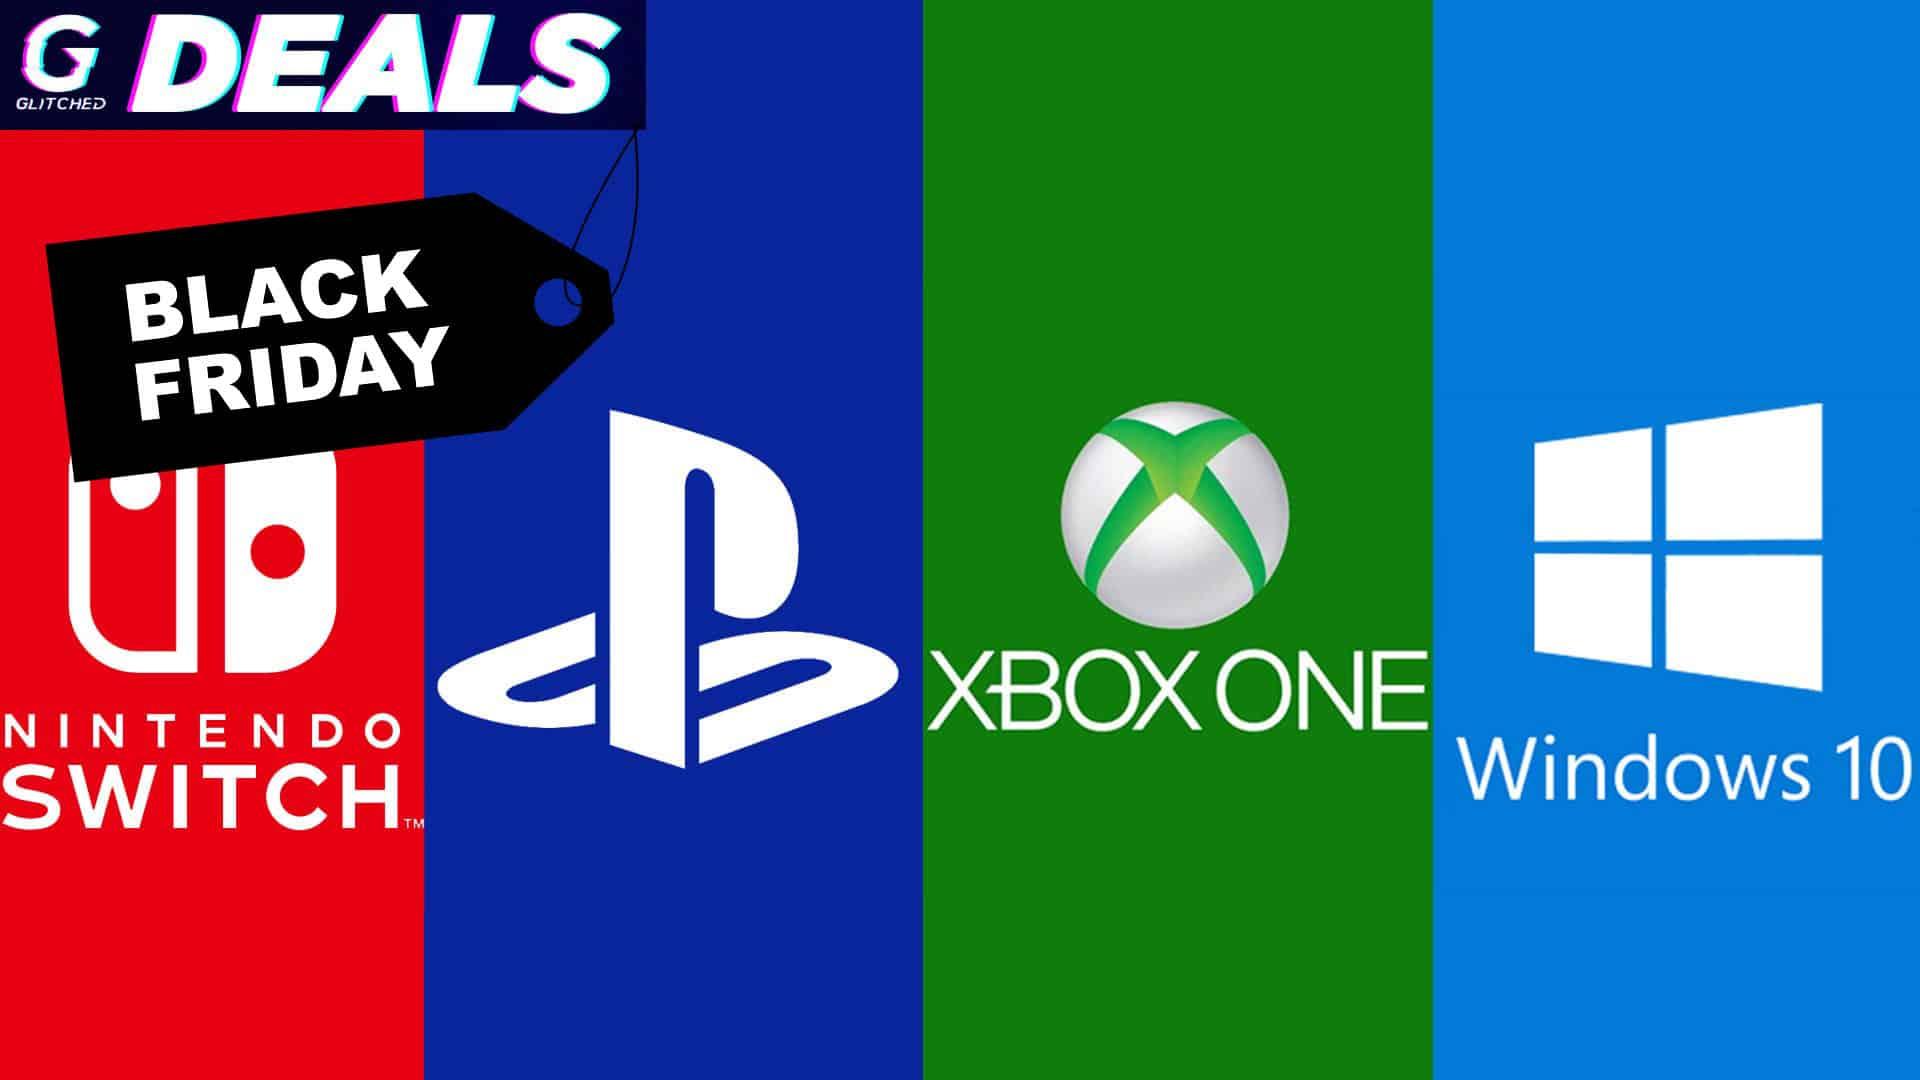 Black Friday video game deals